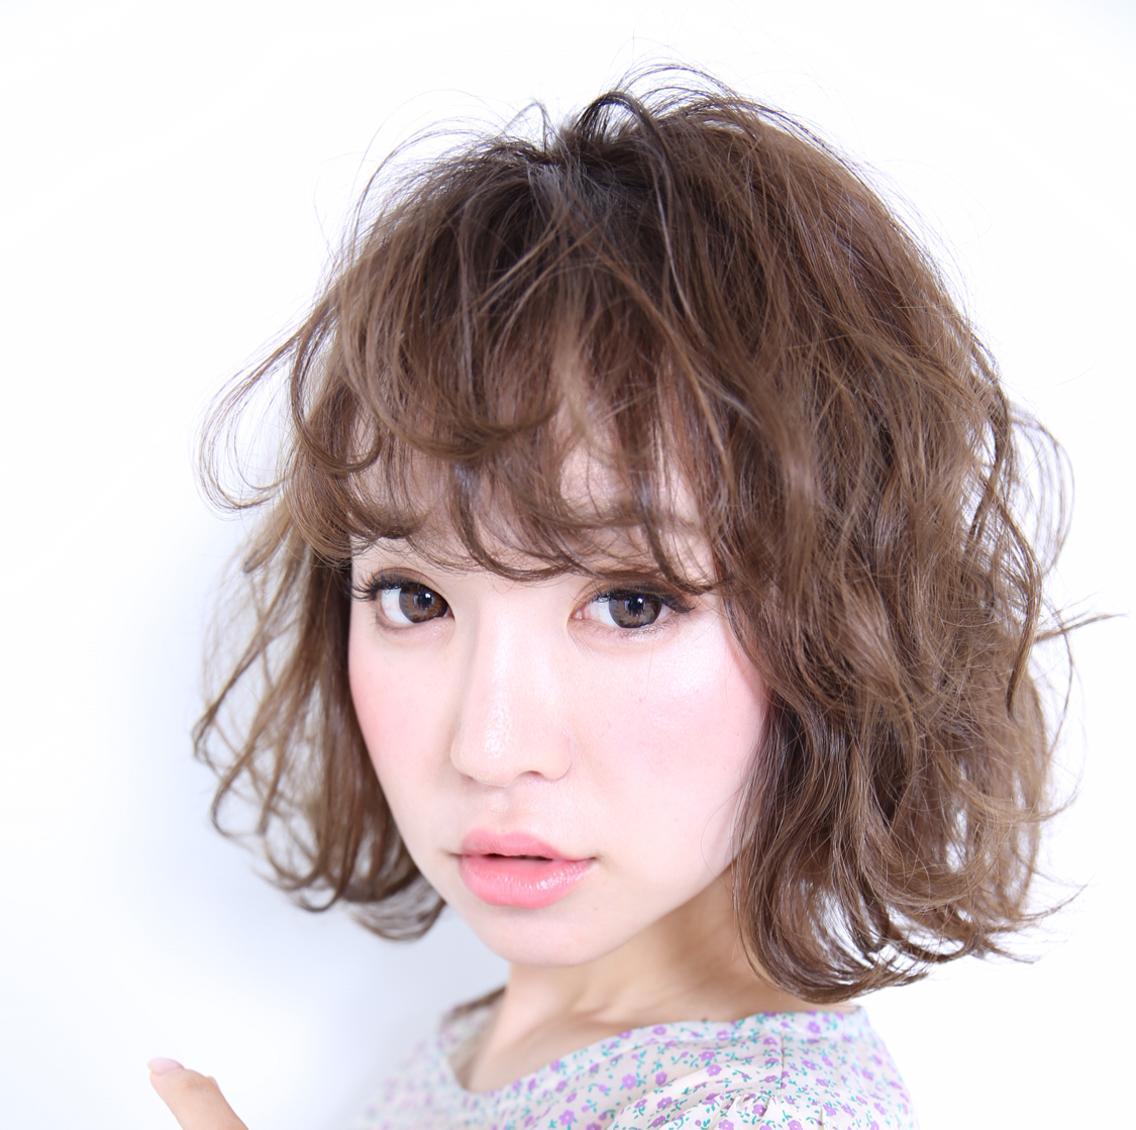 NYNYMothersイオン大日所属・福島隆行の掲載